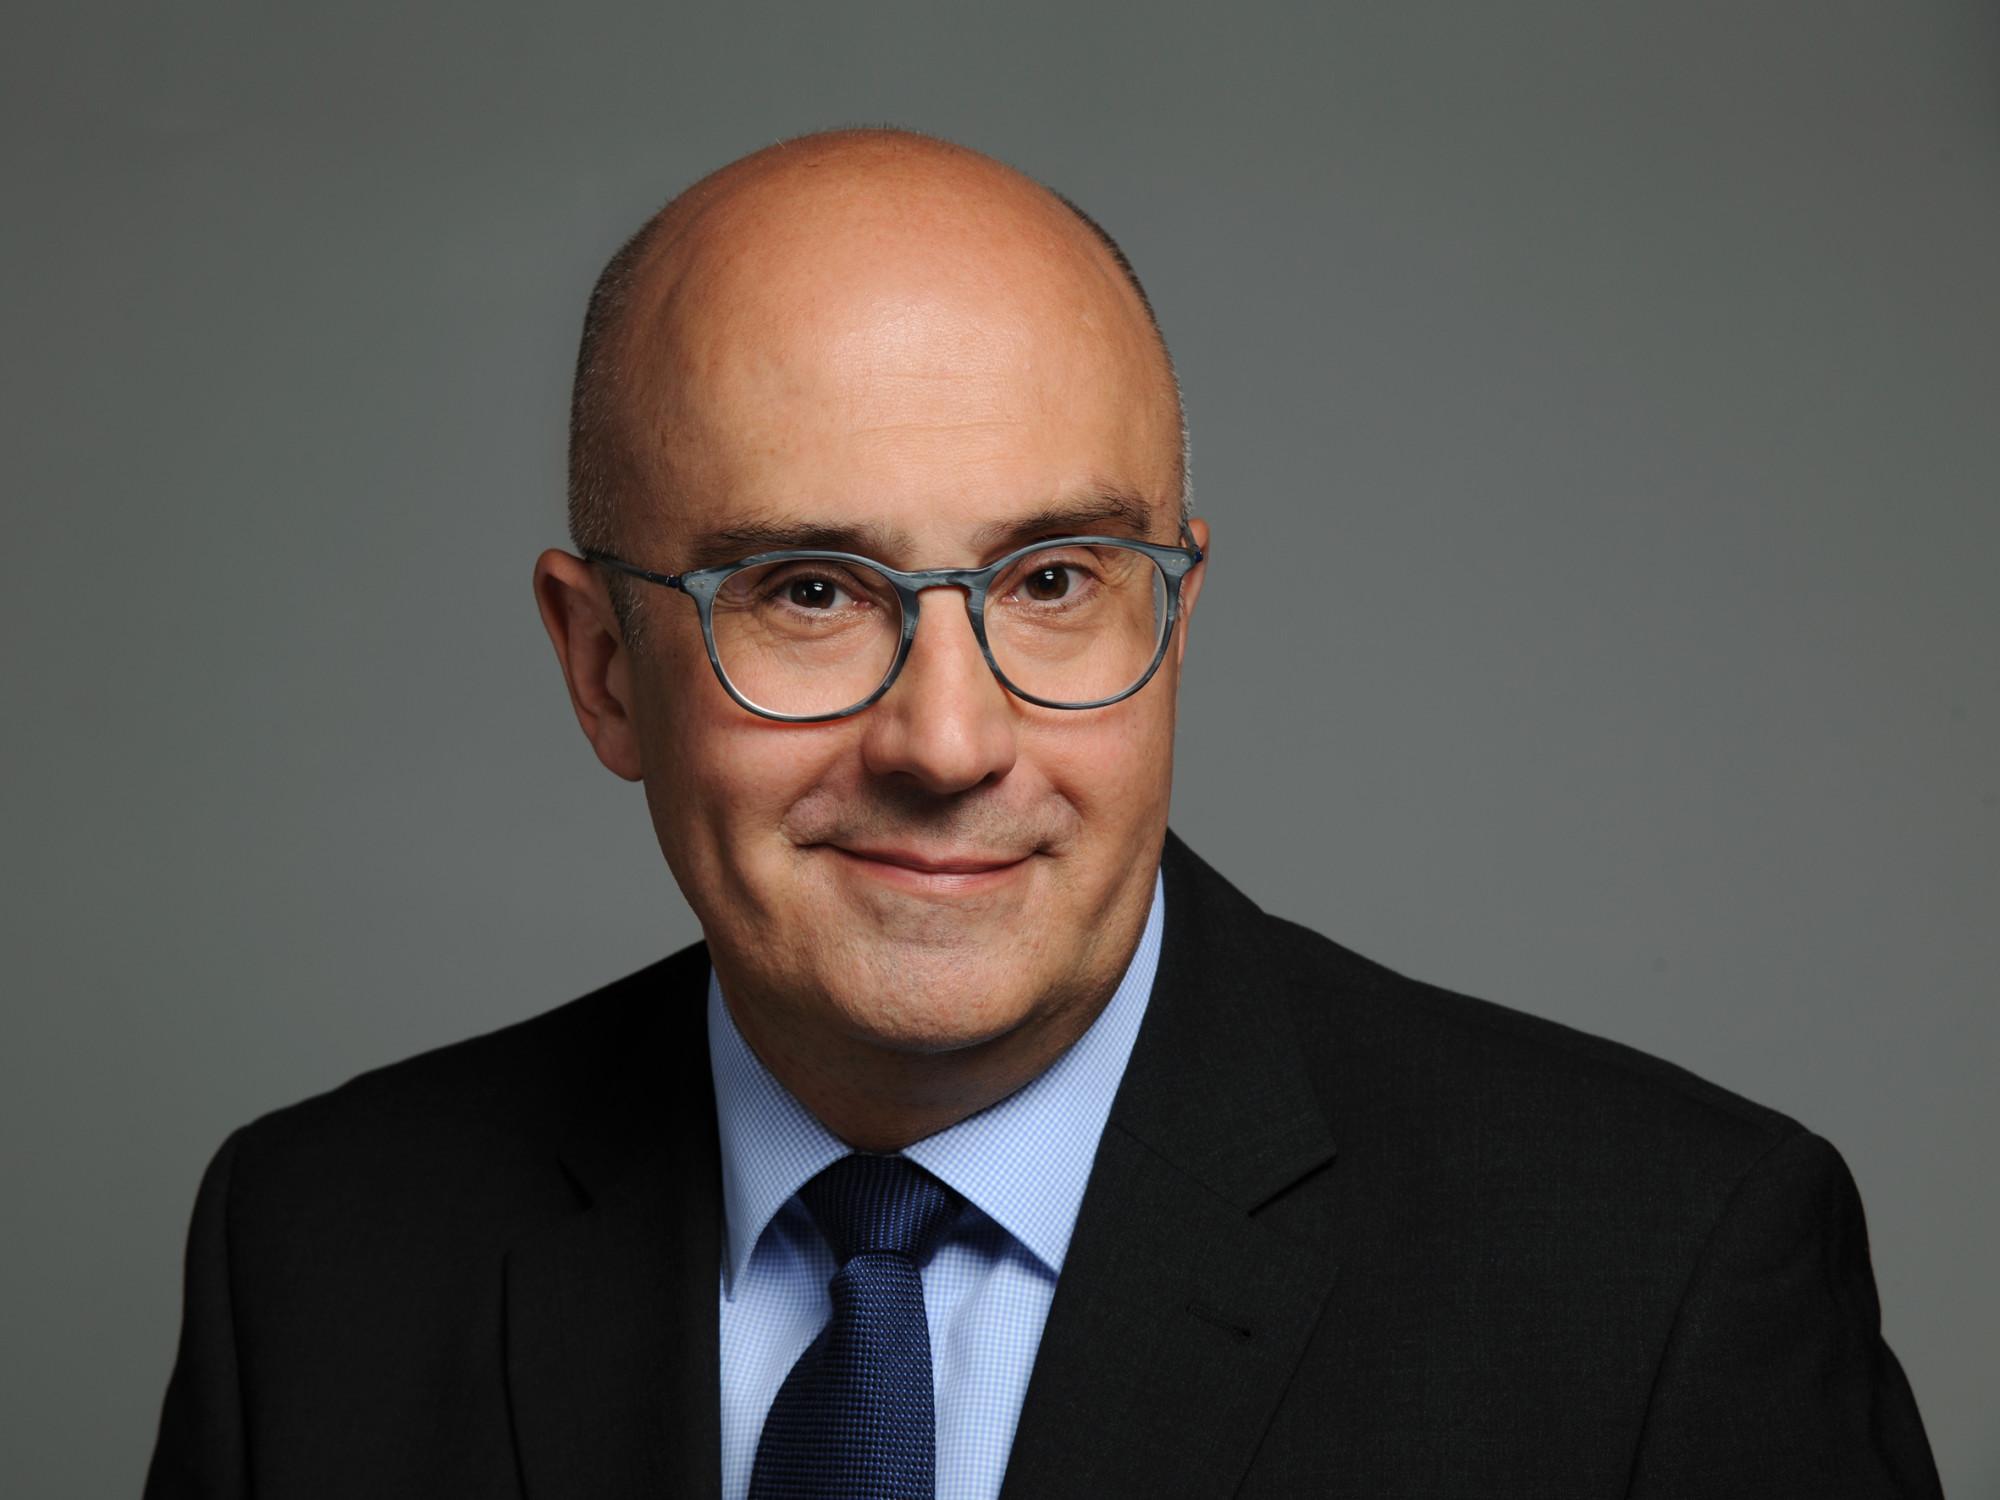 Prof. Dr. Tino Hausotte